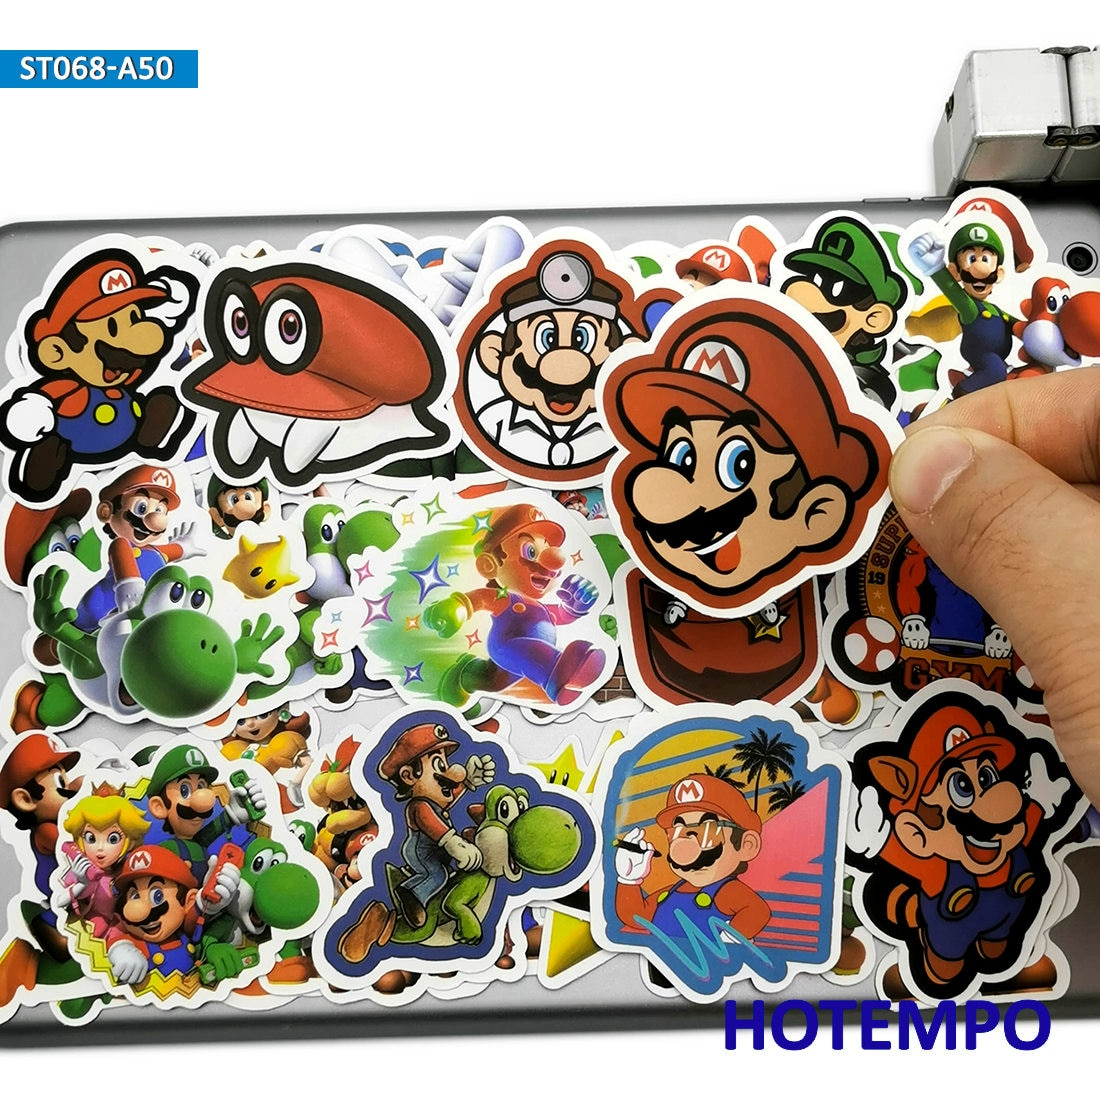 50 Uds dibujos animados Super héroe Mario Luigi calcomanías de Juegos Juguetes para teléfono móvil Laptop equipaje maleta Skateboard Anime pegatina